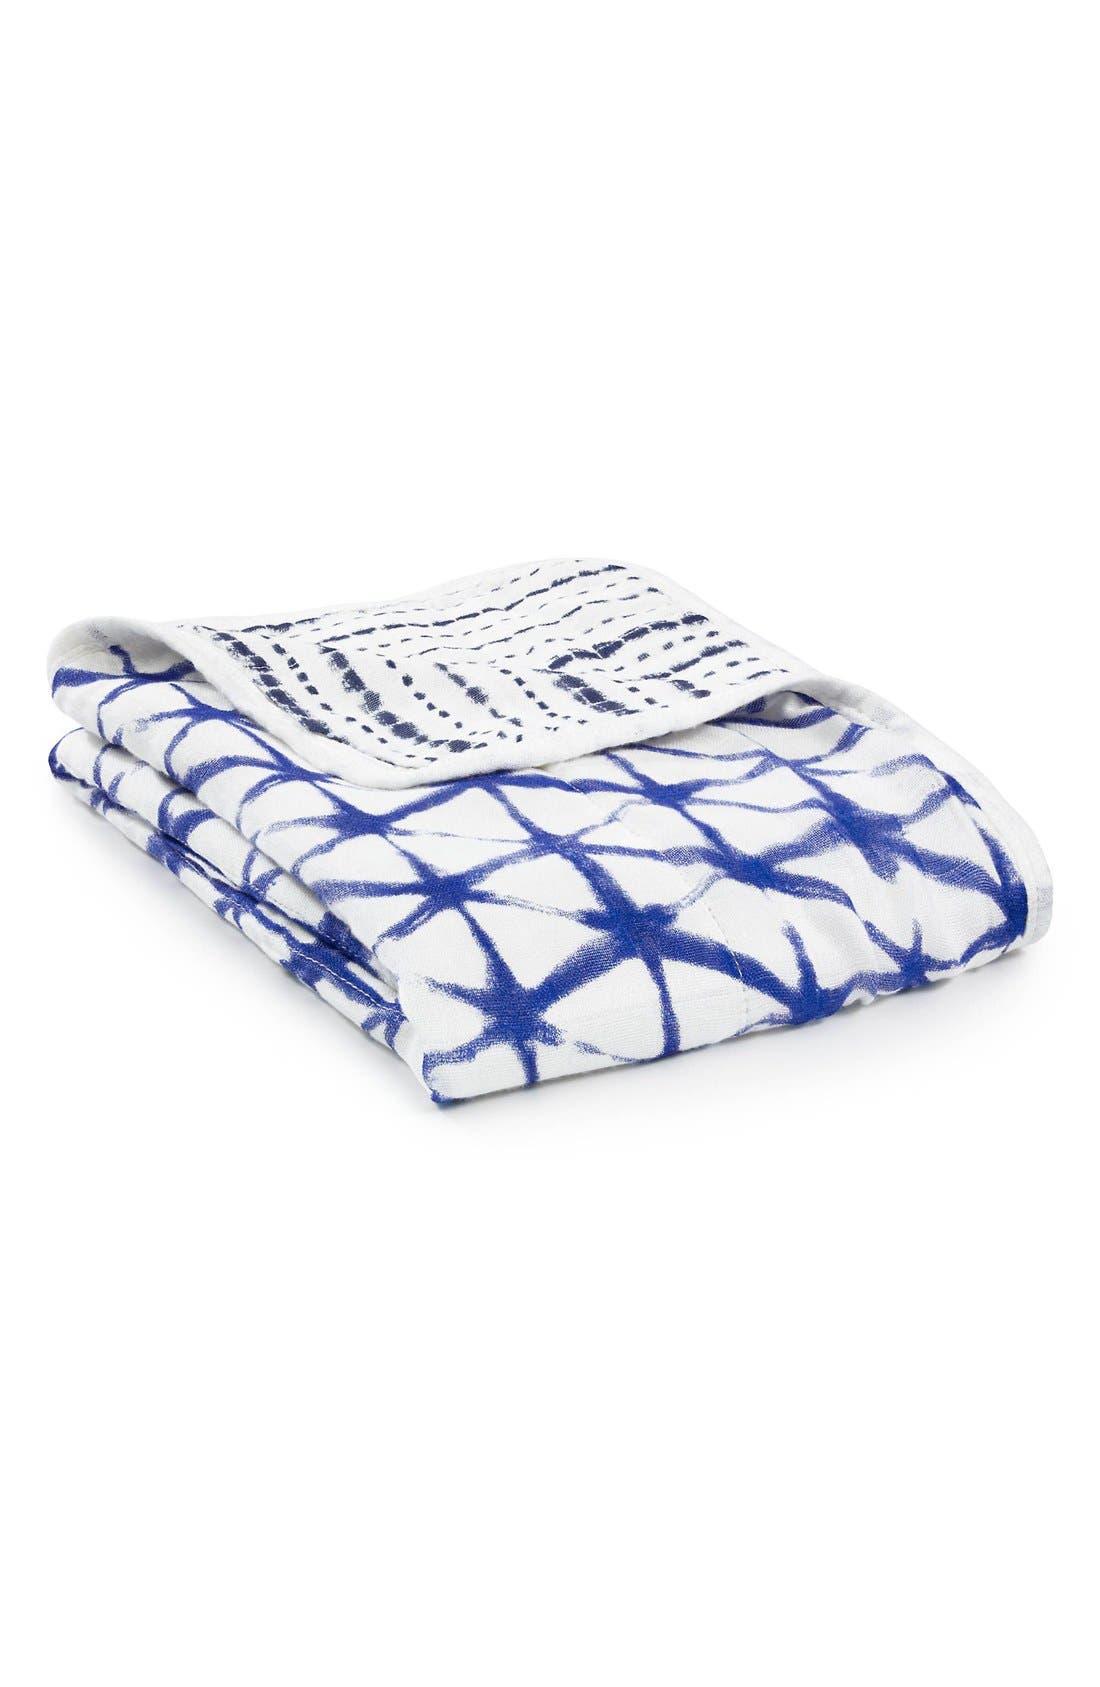 aden + anais Silky Soft Muslin Stroller Blanket